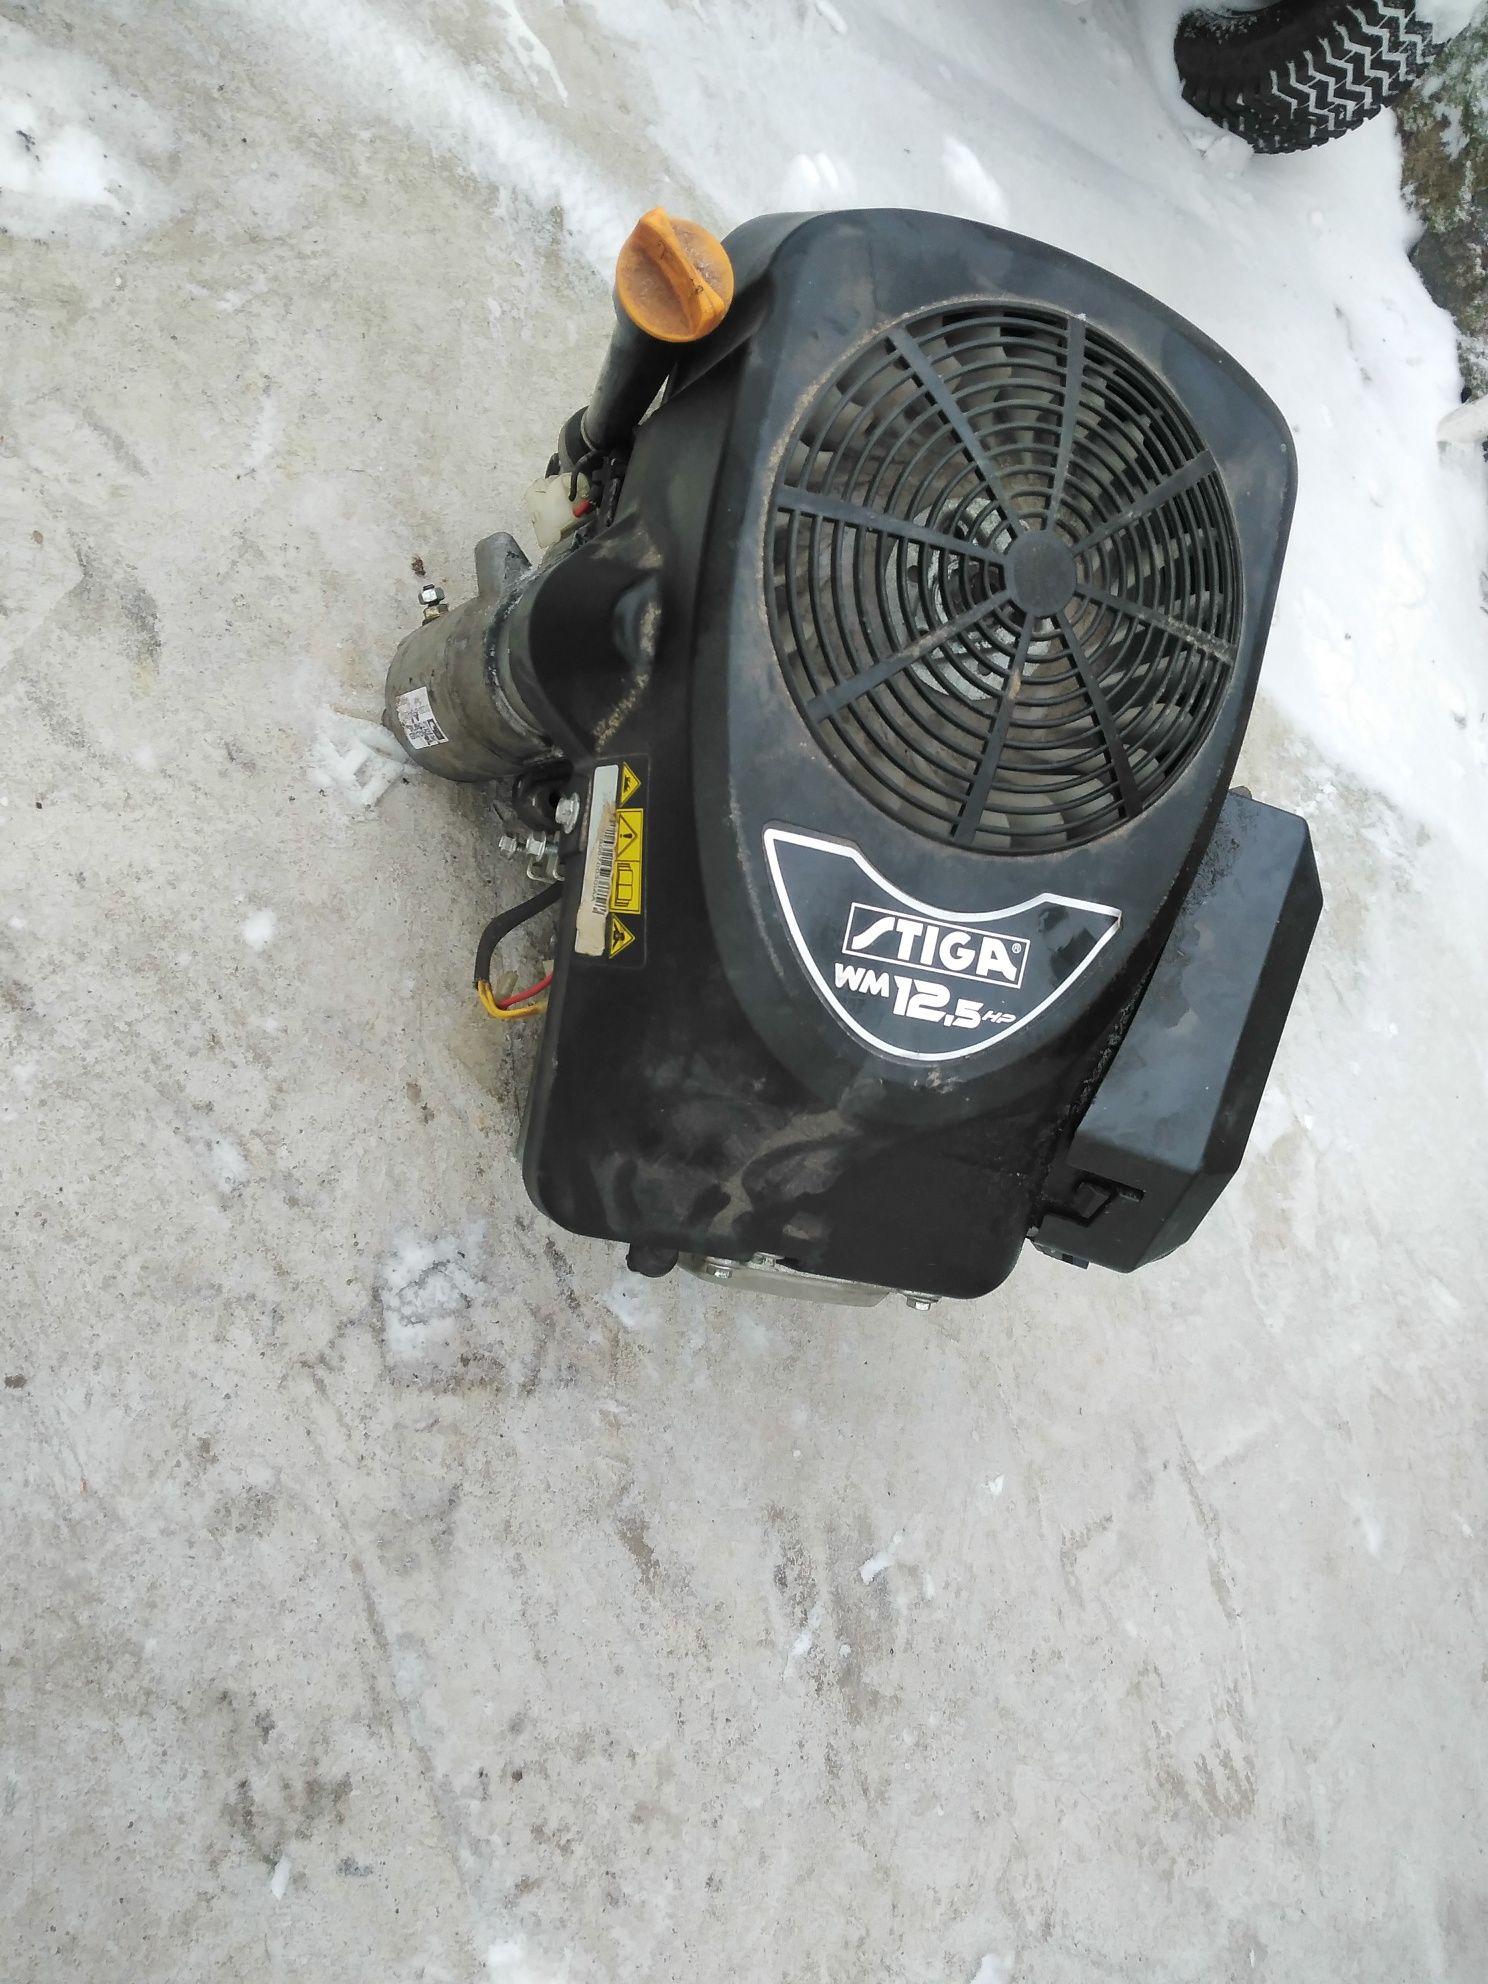 Traktorek kosiarka kampletny silnik 12.5 hp b/s  stiga  sprawny